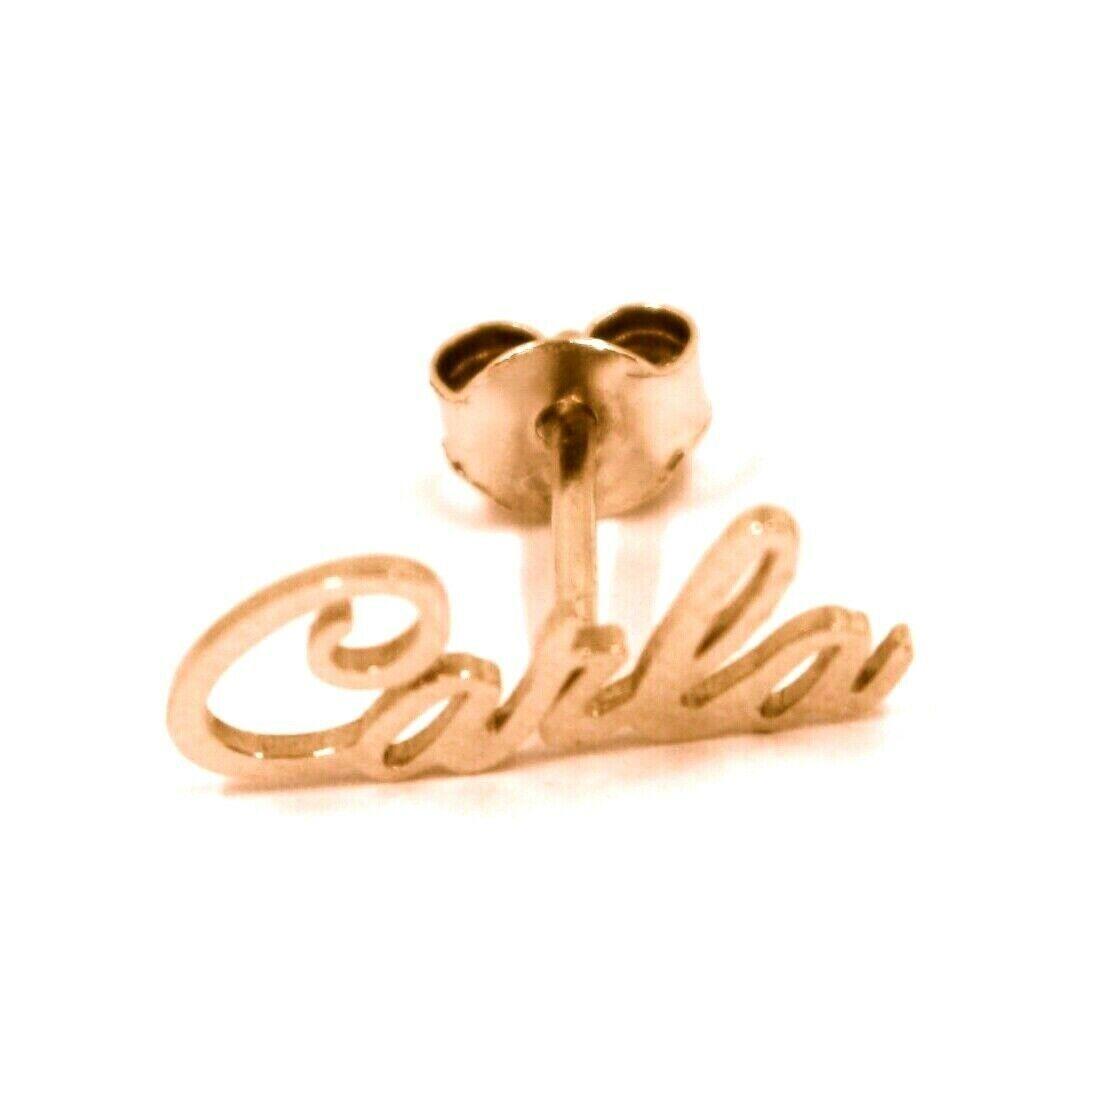 925 STERLING SILVER ROSE EARRINGS, WRITTEN NAME CARLA, MADE IN ITALY